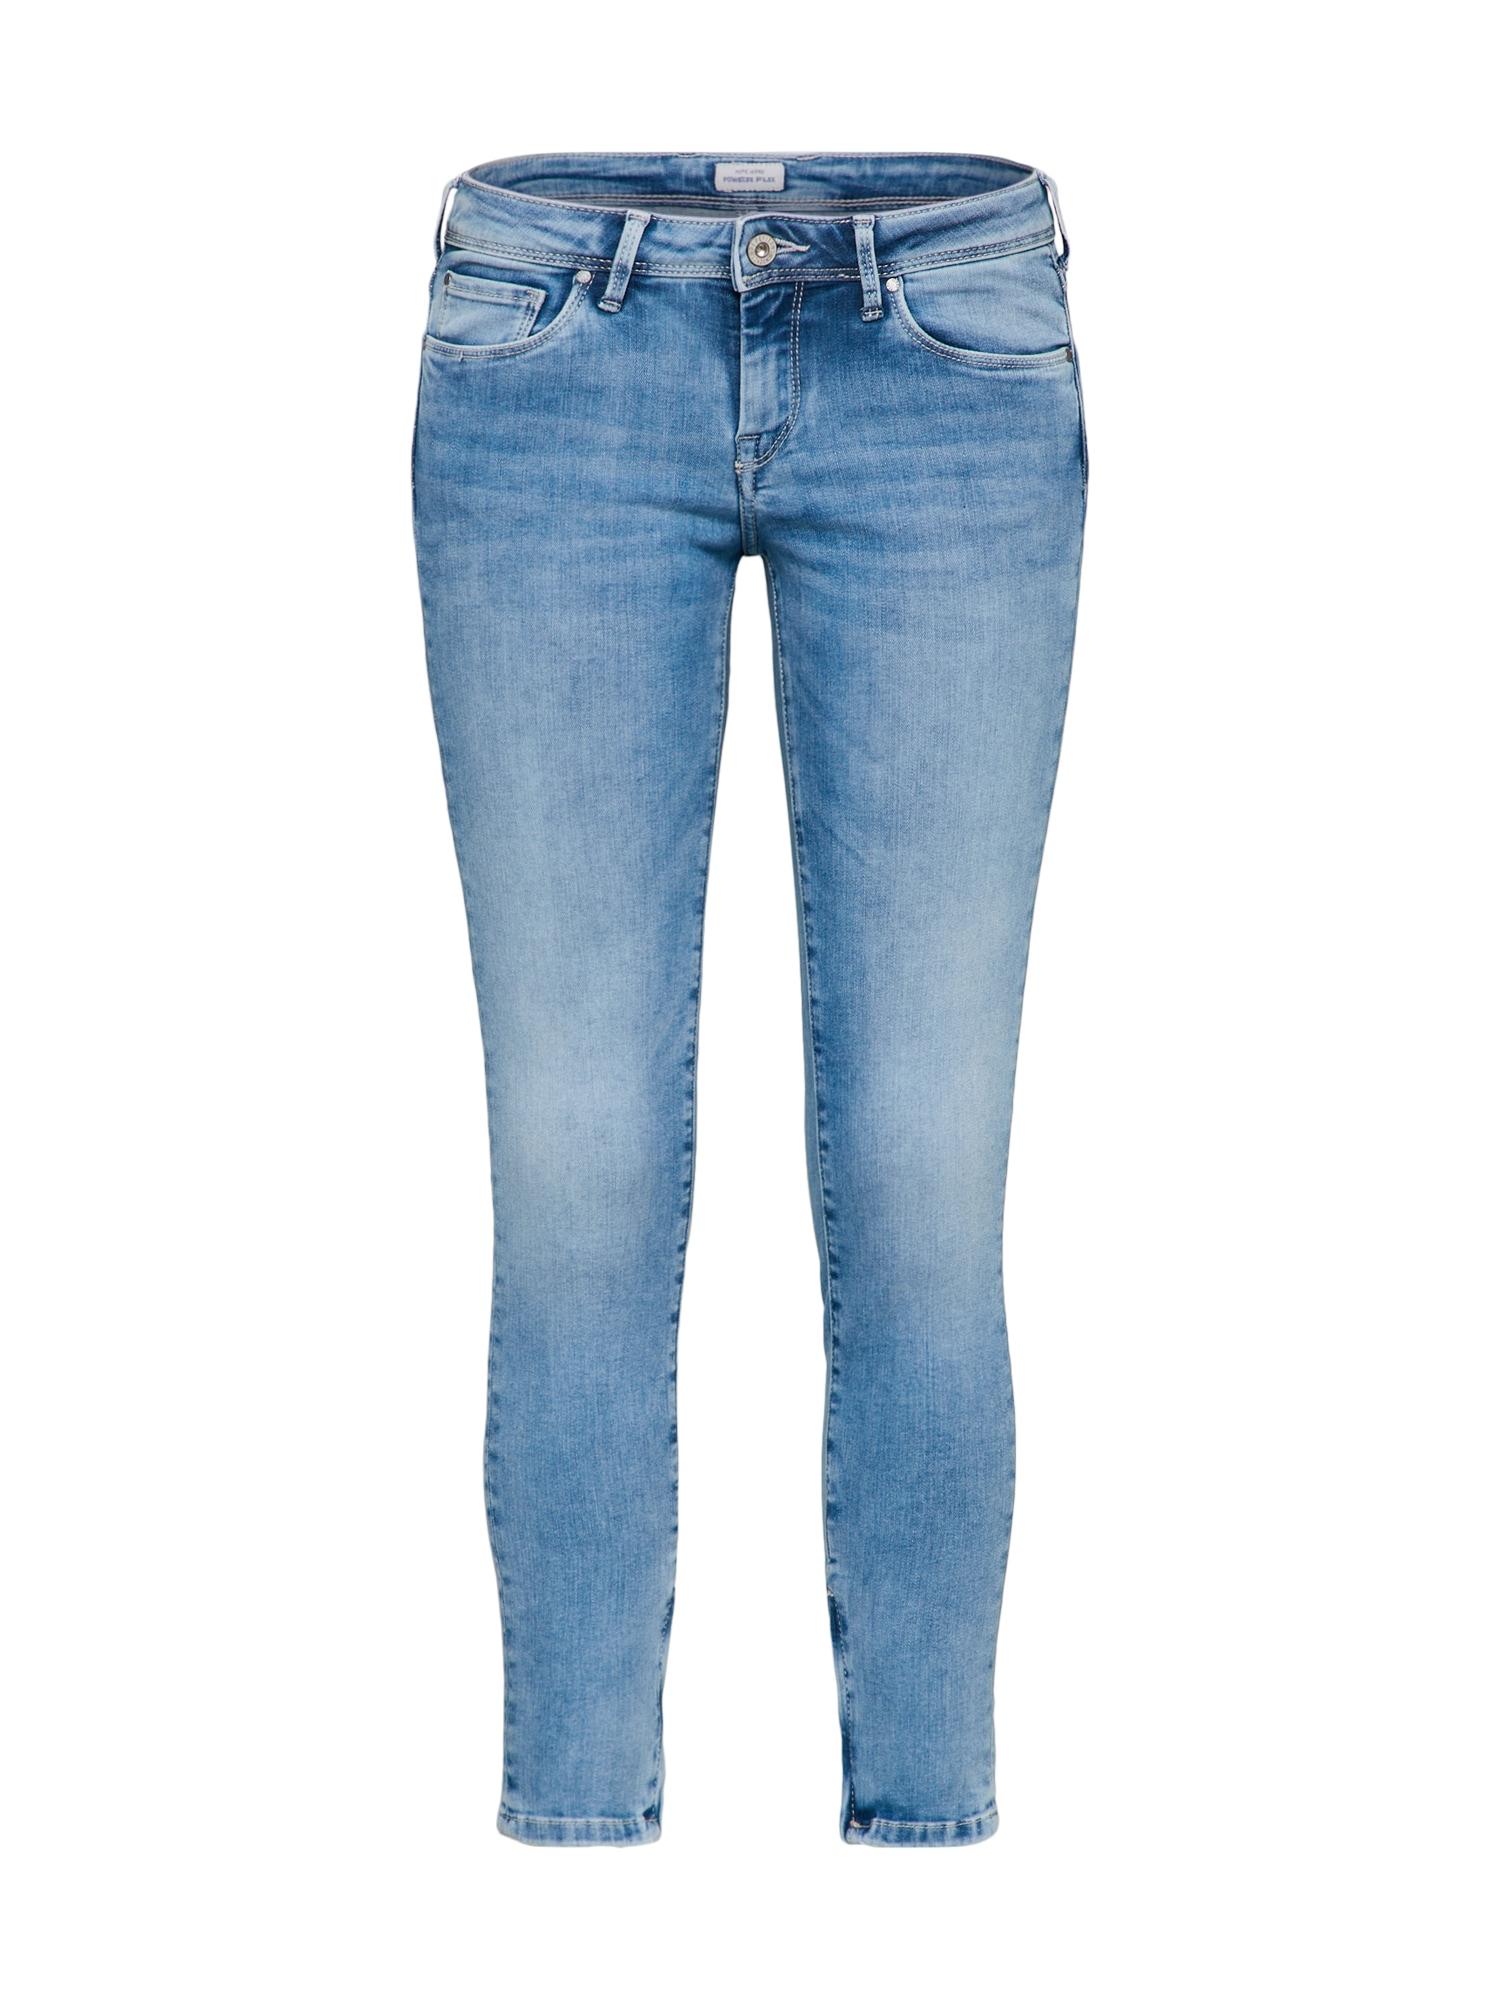 Pepe Jeans Dames Jeans Cher blue denim